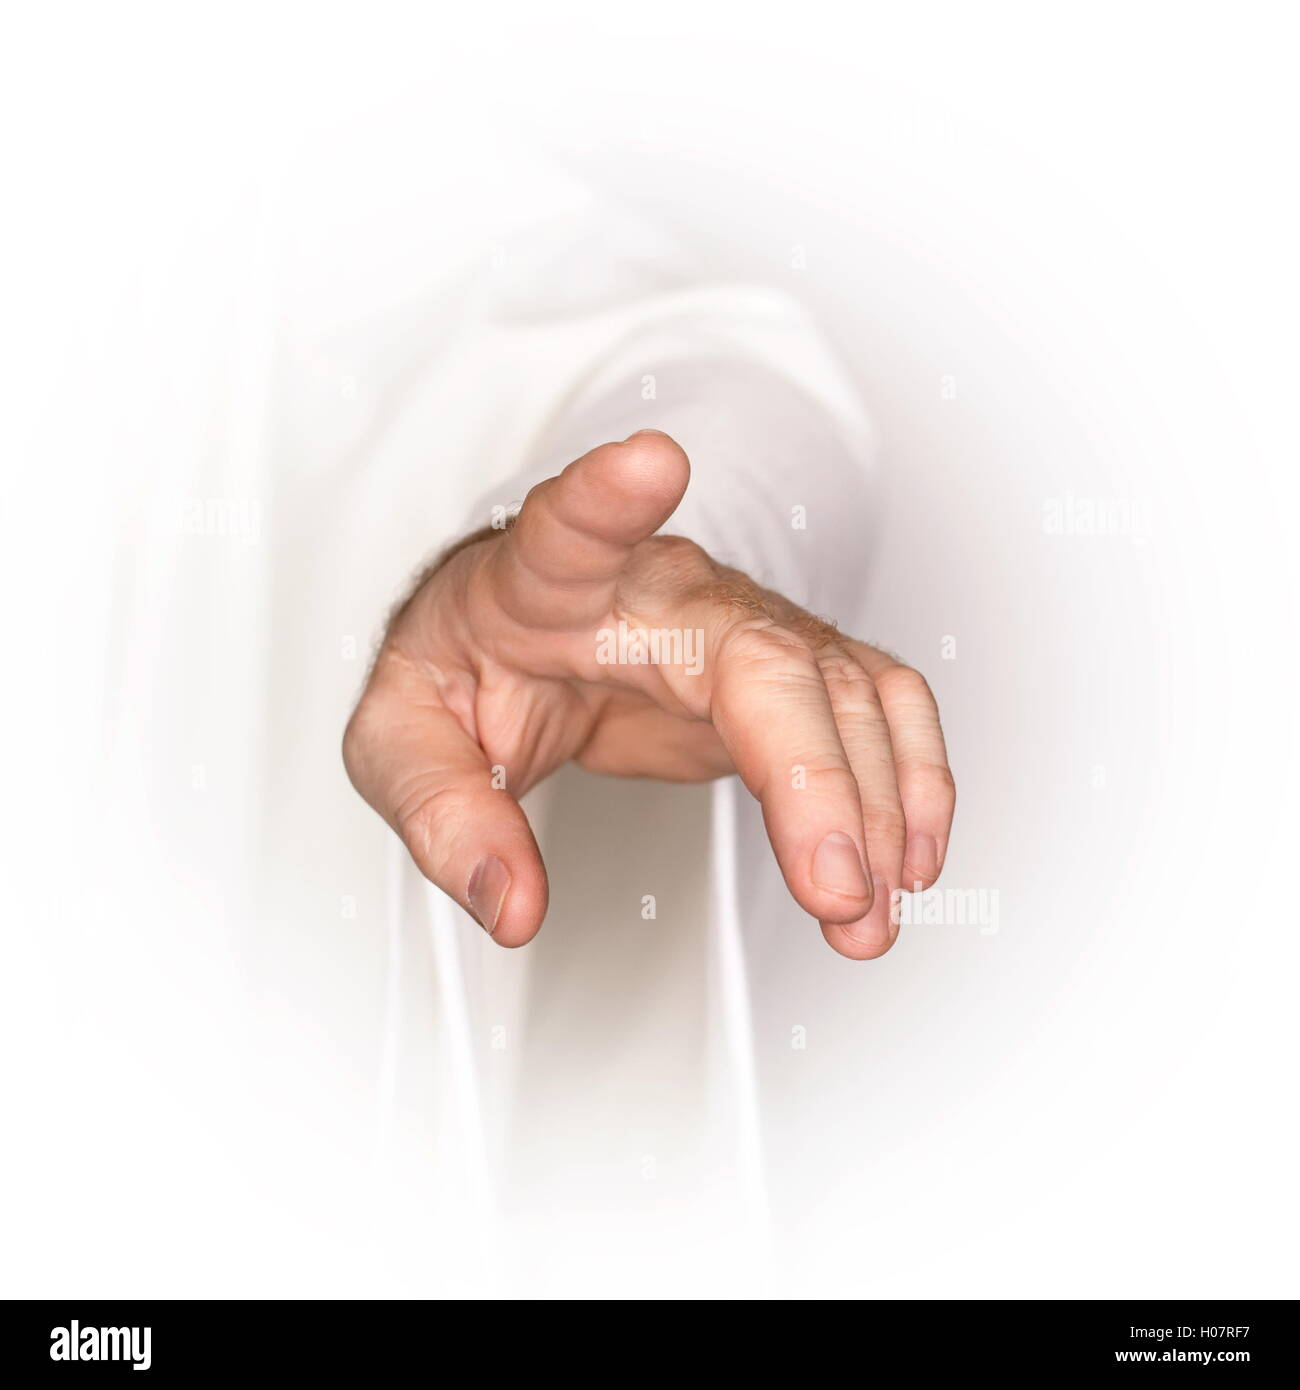 Showing towards you - Stock Image